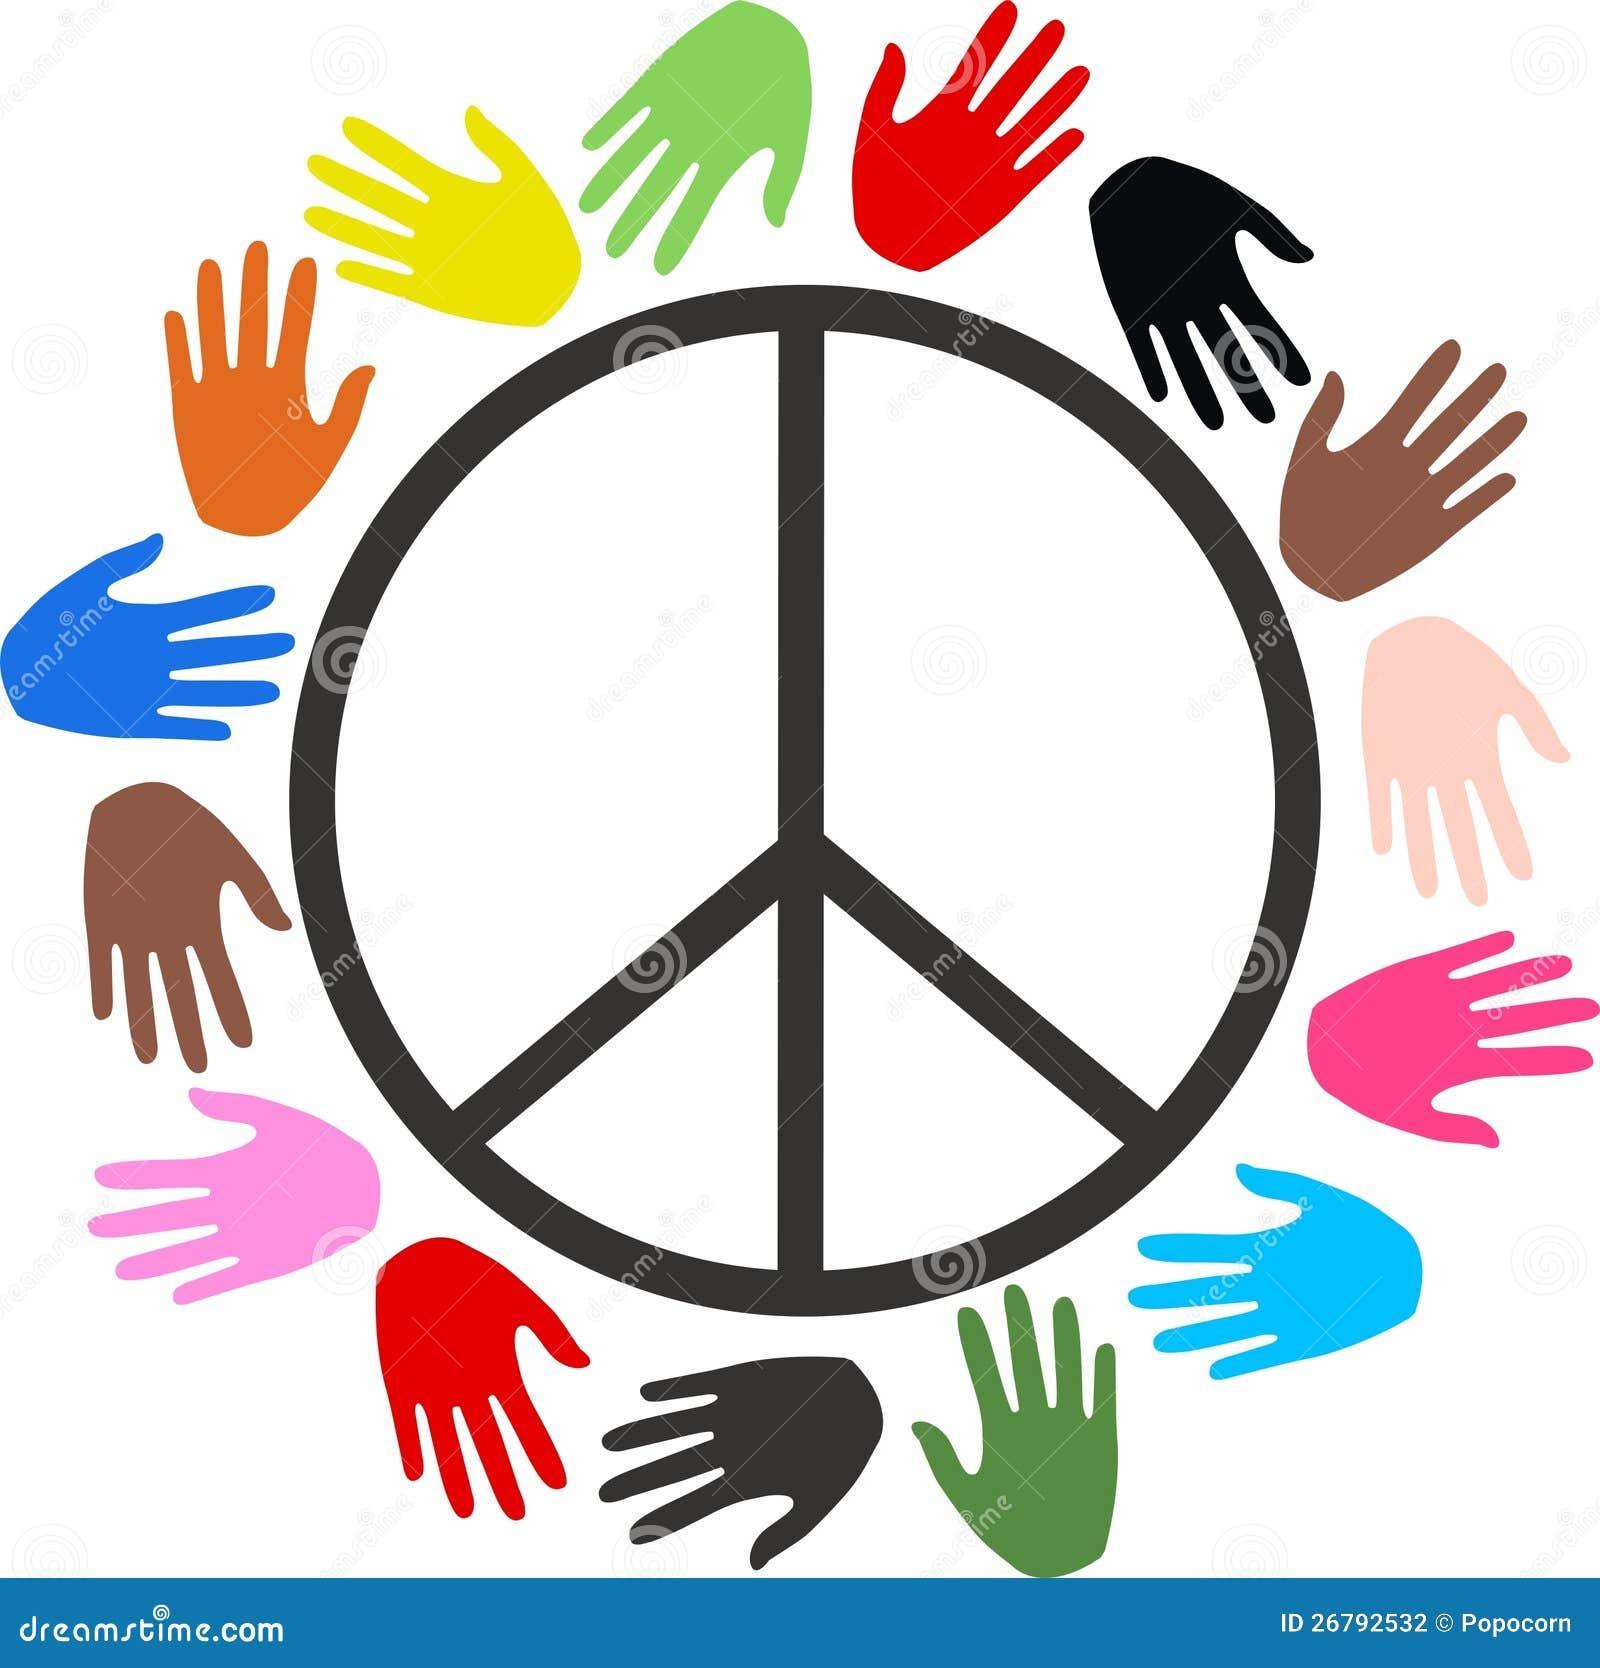 Freedom Peace Diversity Stock Photography - Image: 26792532